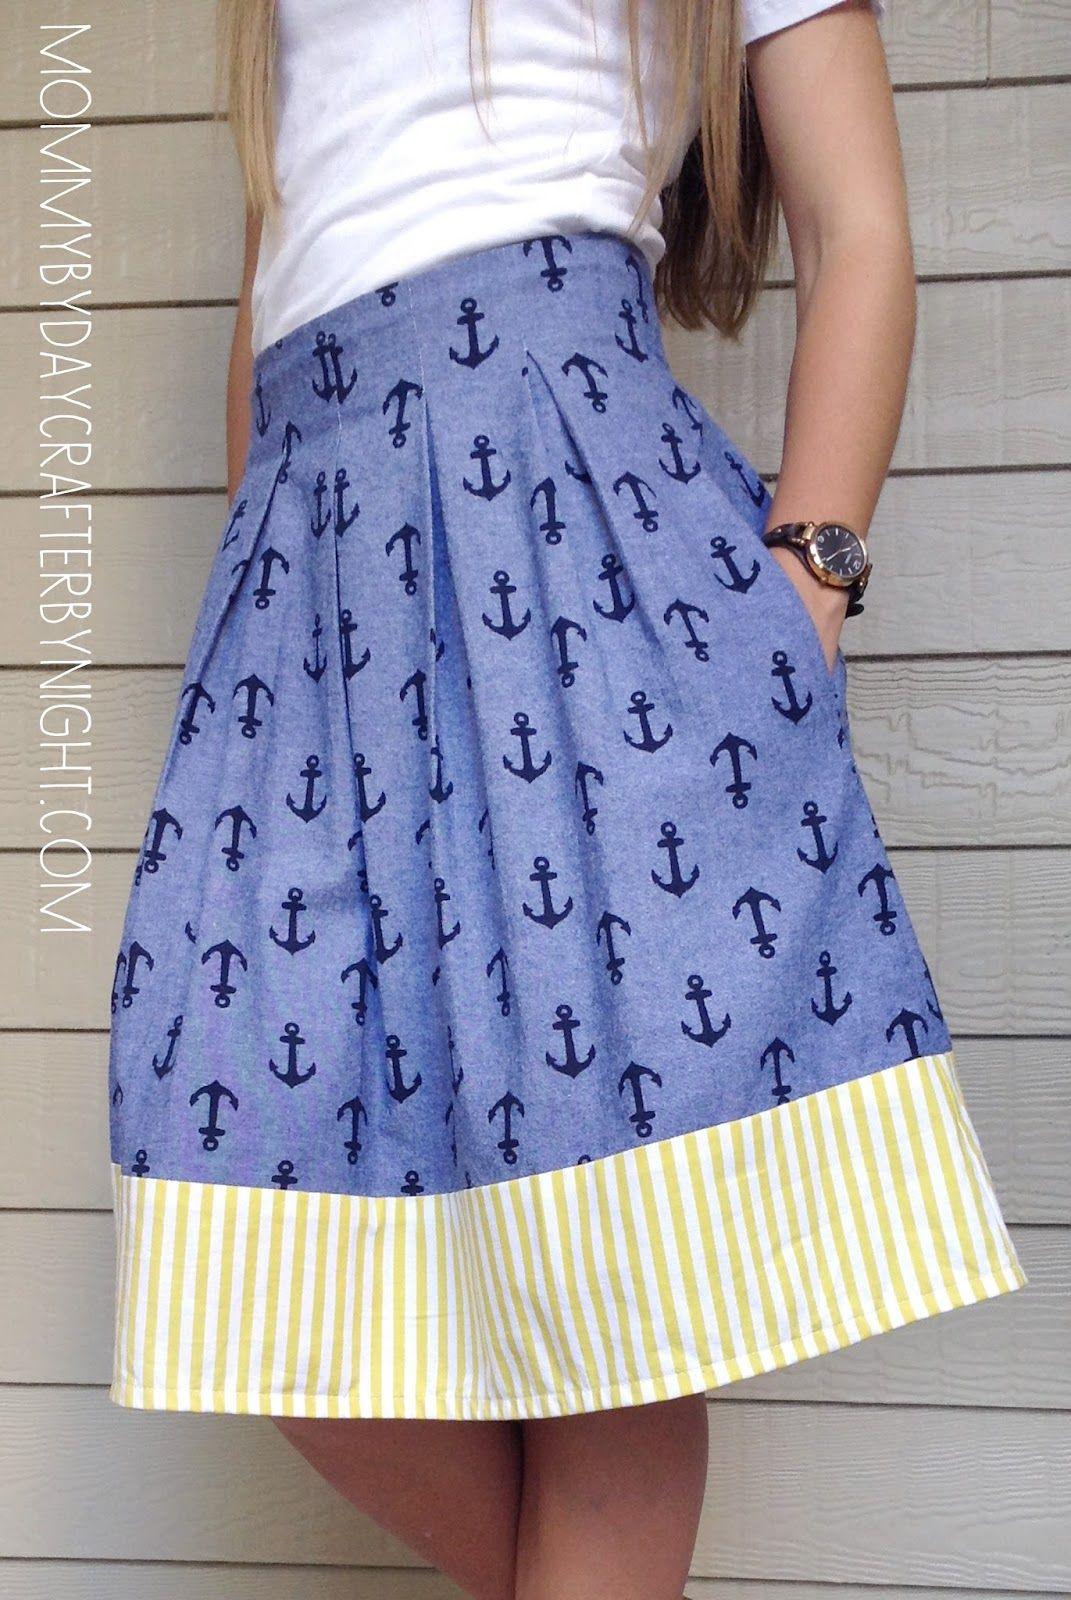 Anchor Chardon Skirt | Kleidung nähen, Nähen und Erwachsene